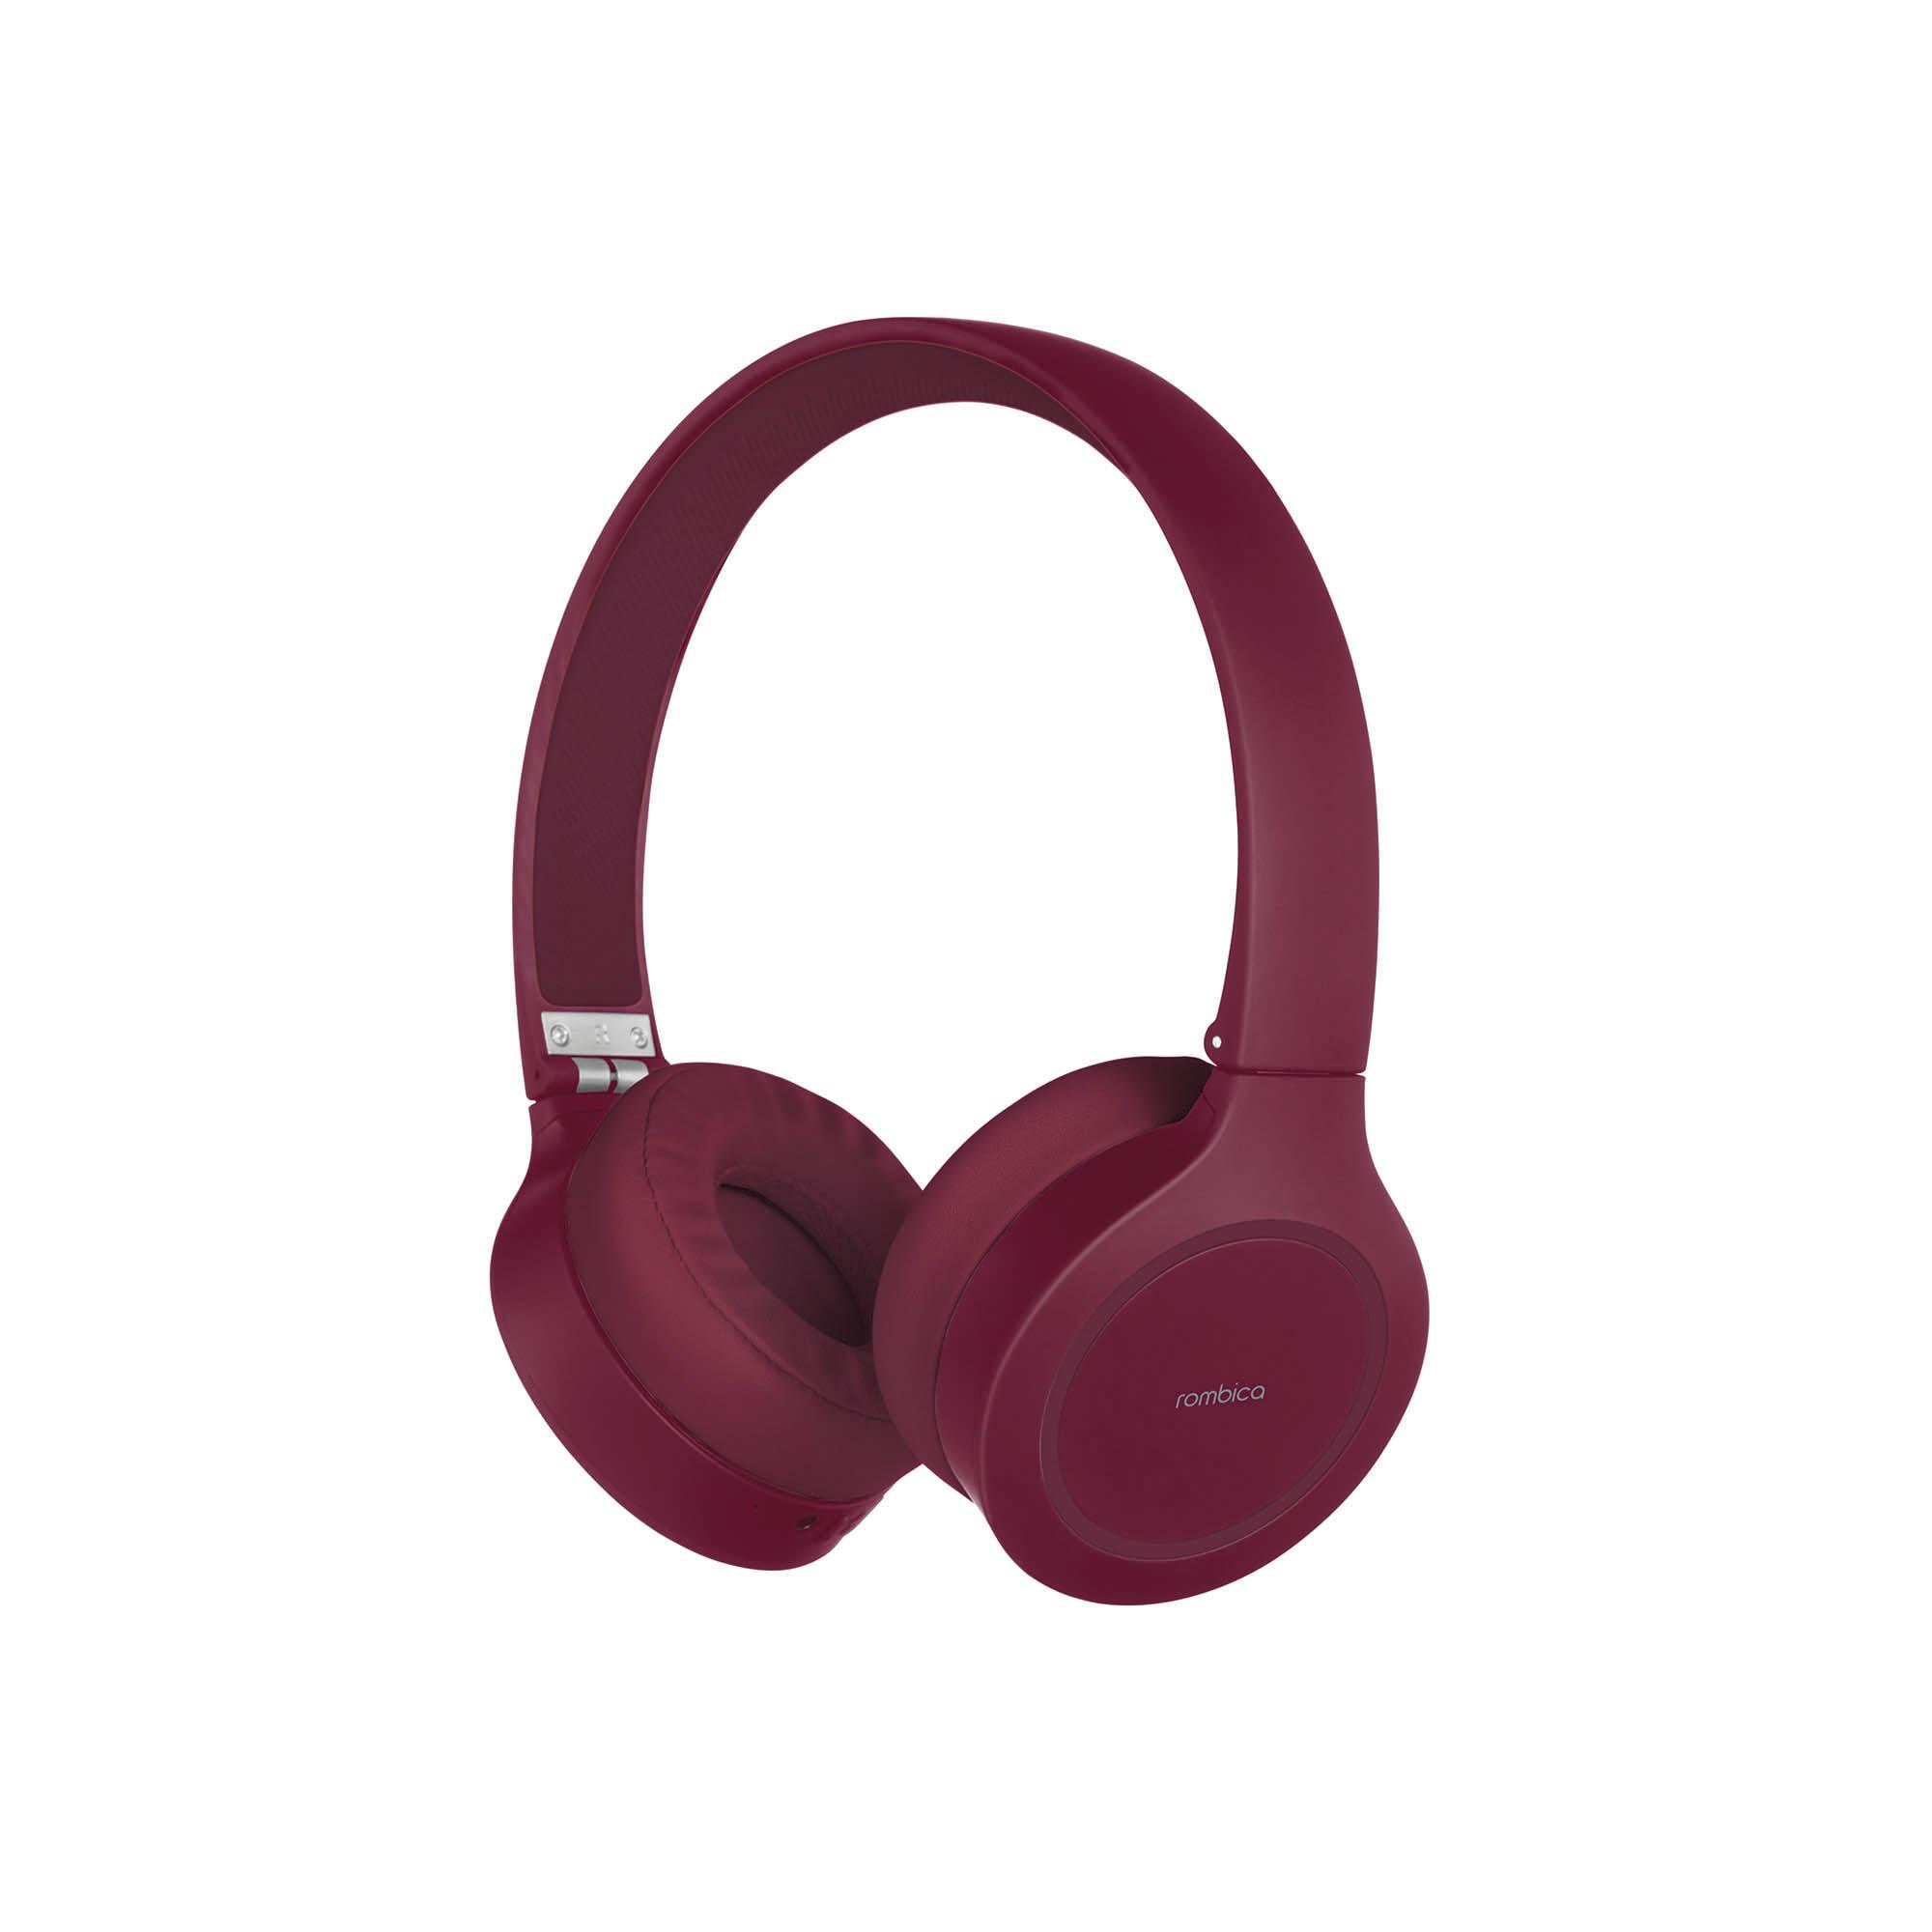 Rombica mysound BH-08 Cherry